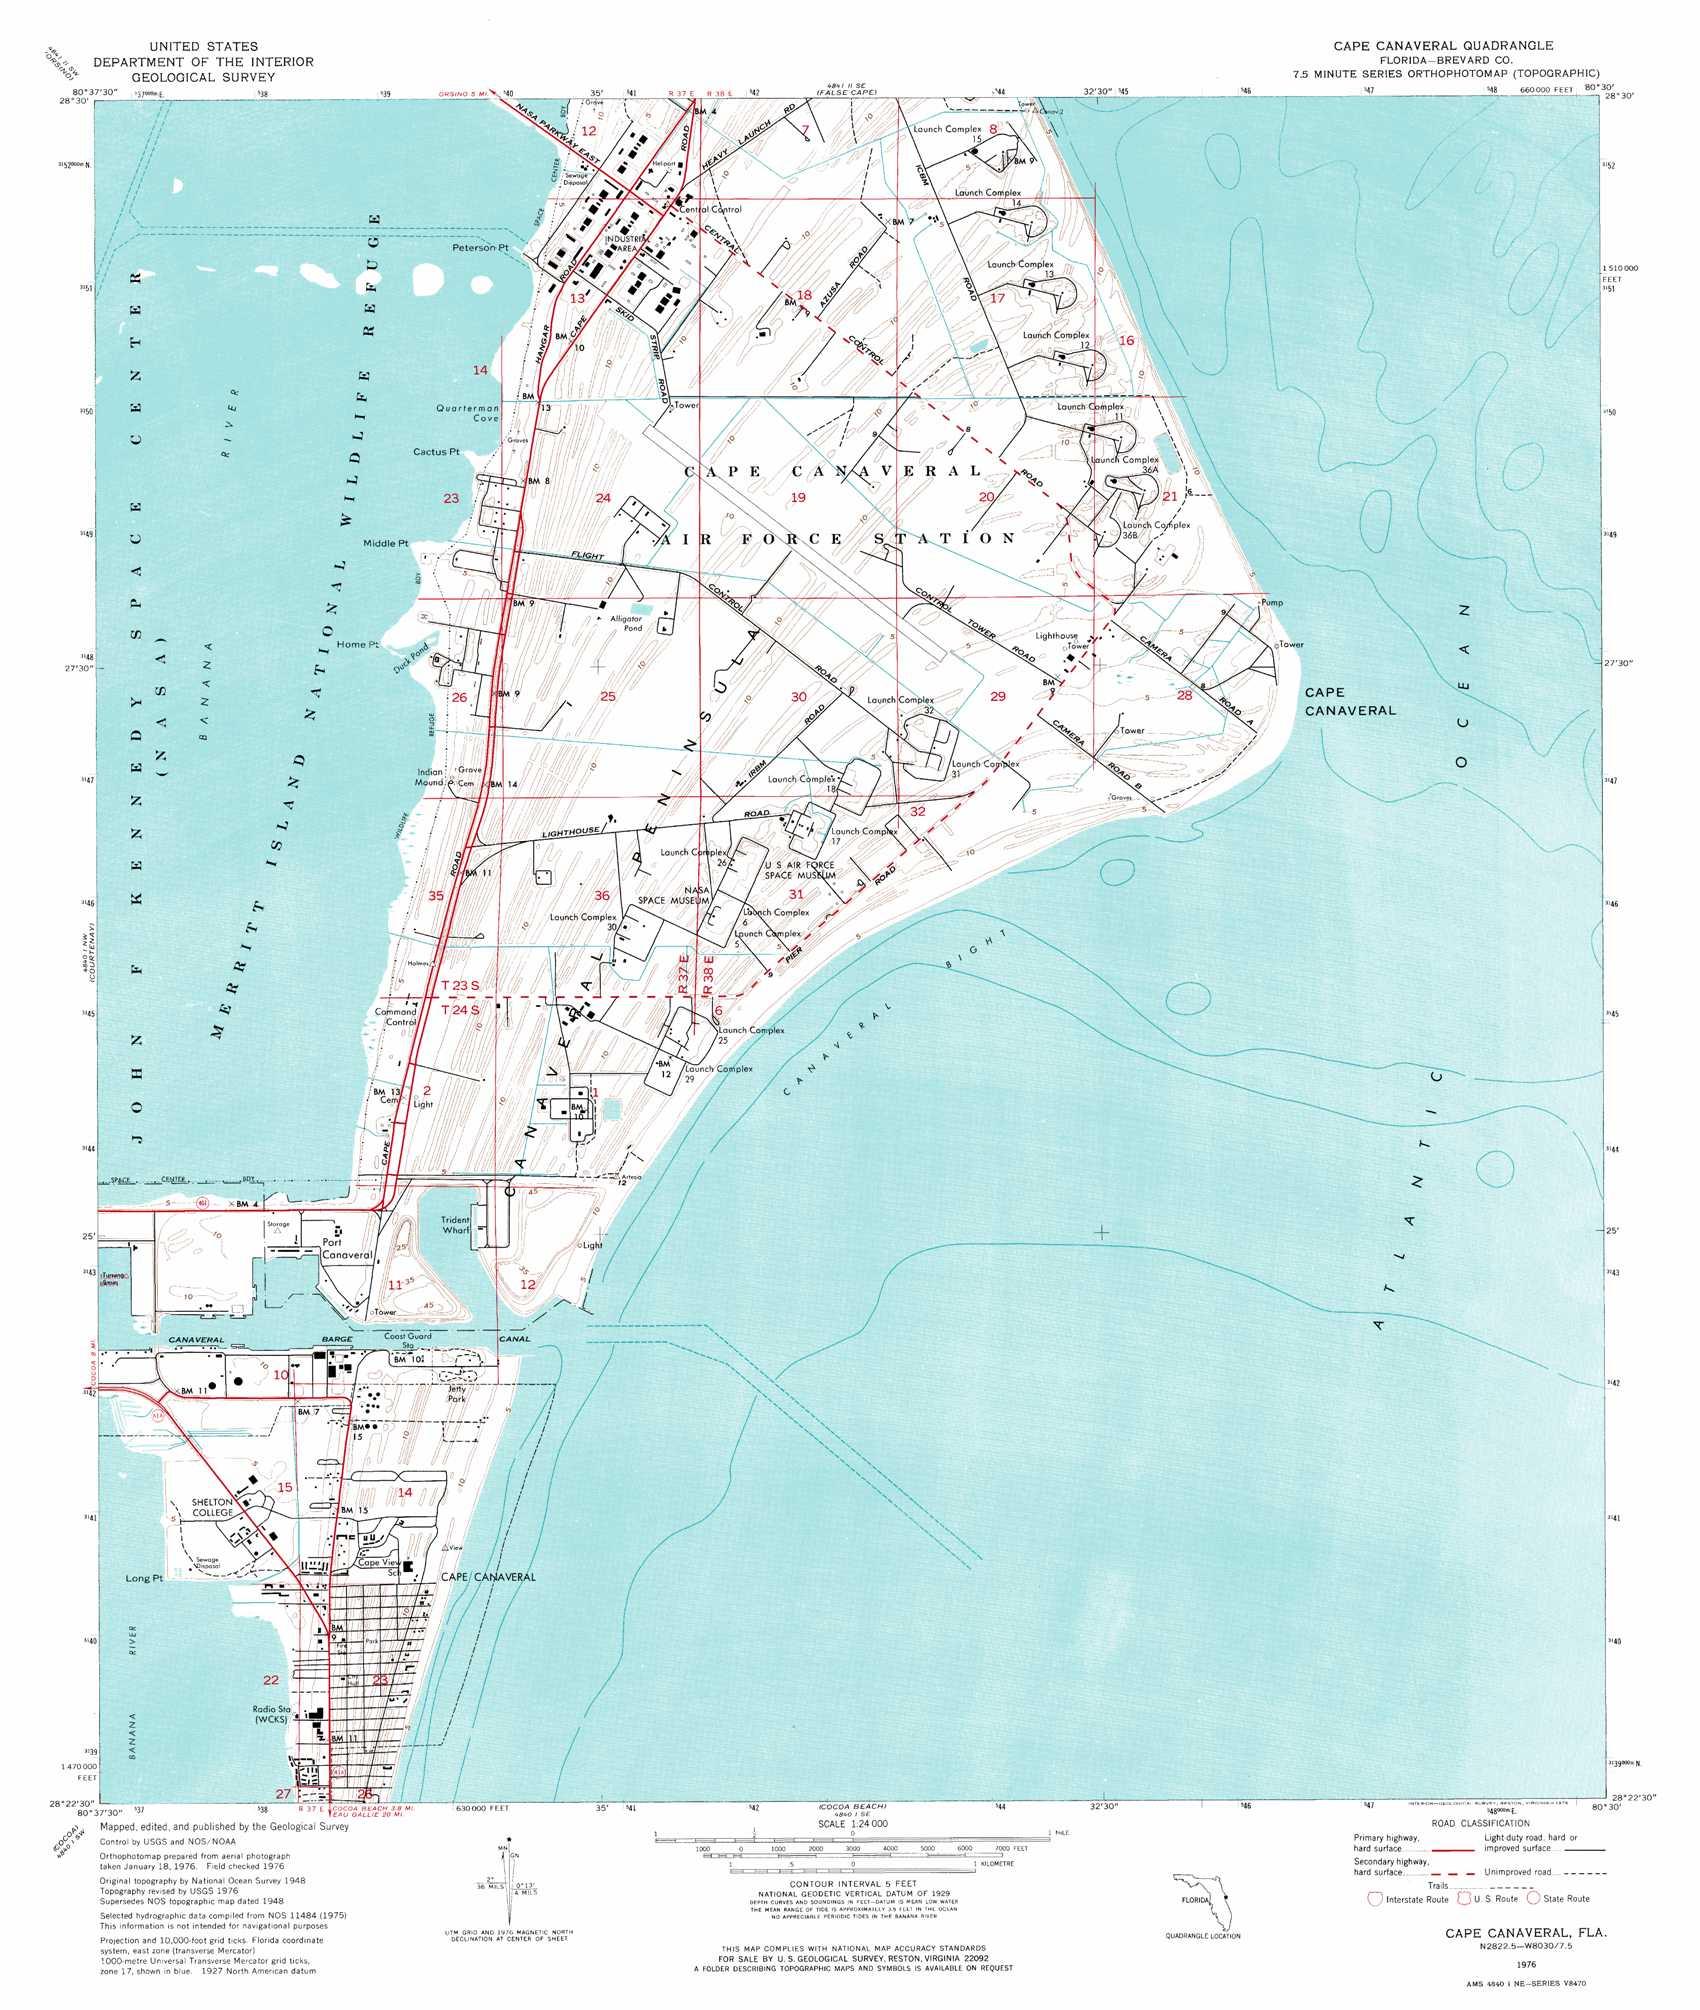 Cape Canaveral Topographic Map FL